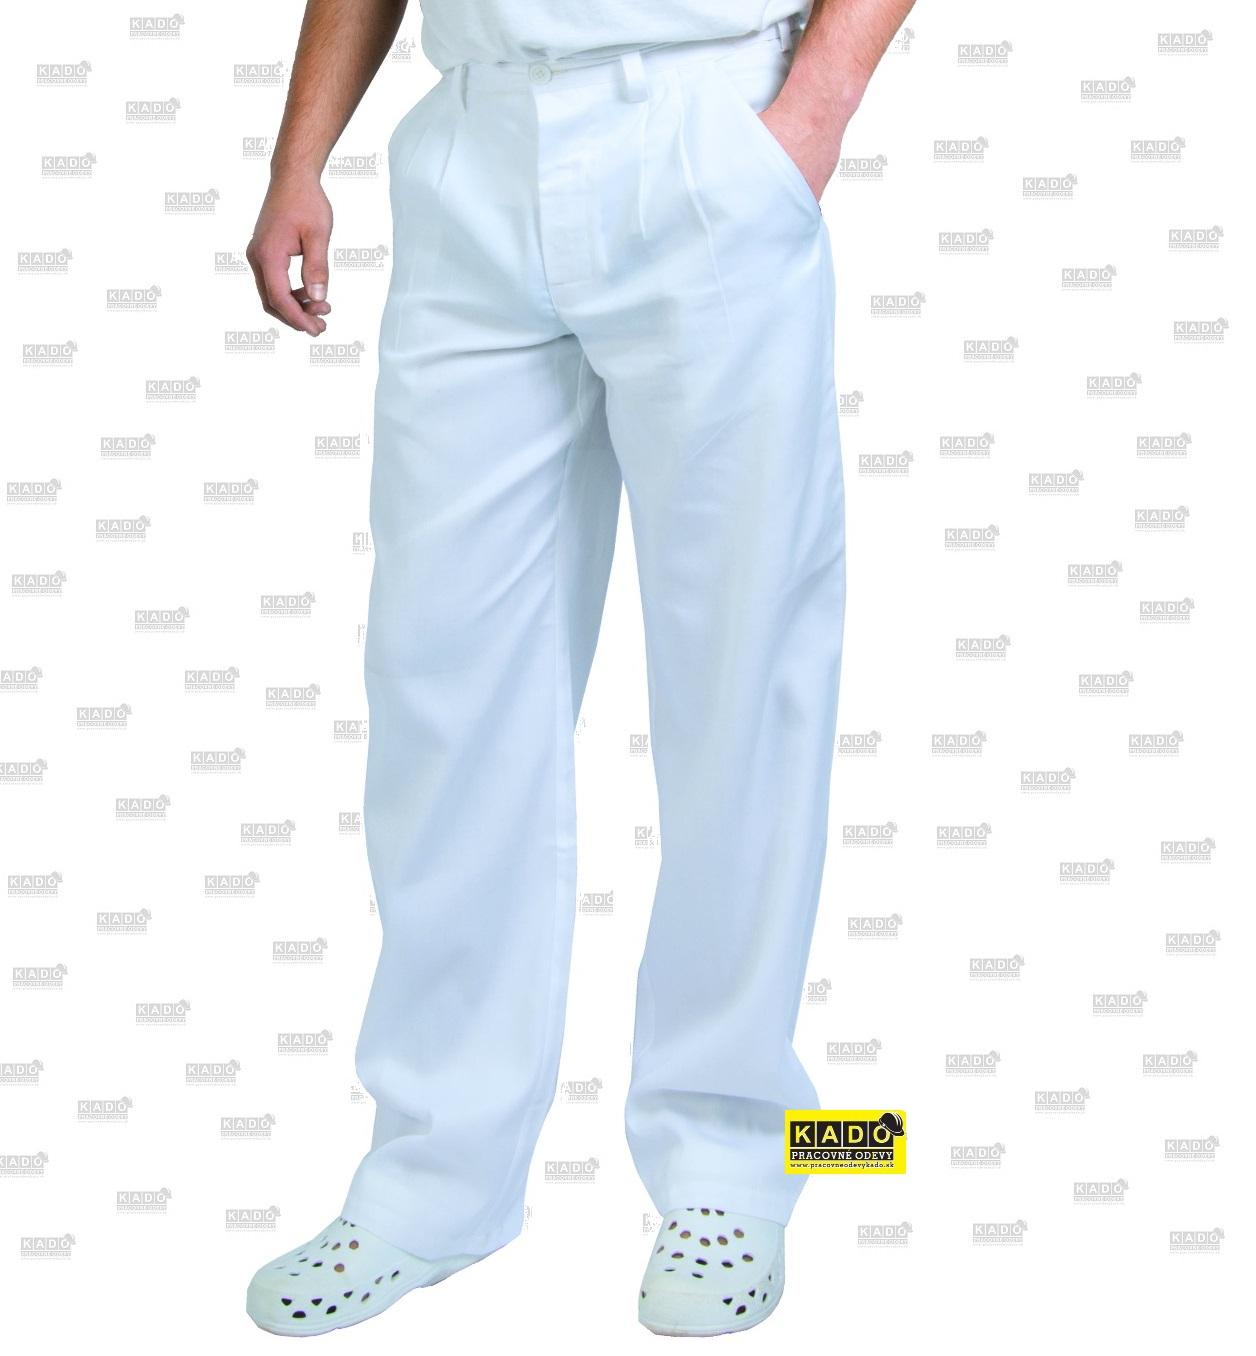 c15d991d7 Pracovné odevy - Nohavice biele ARTUR CXS pánske | PRACOVNÉ ODEVY ...